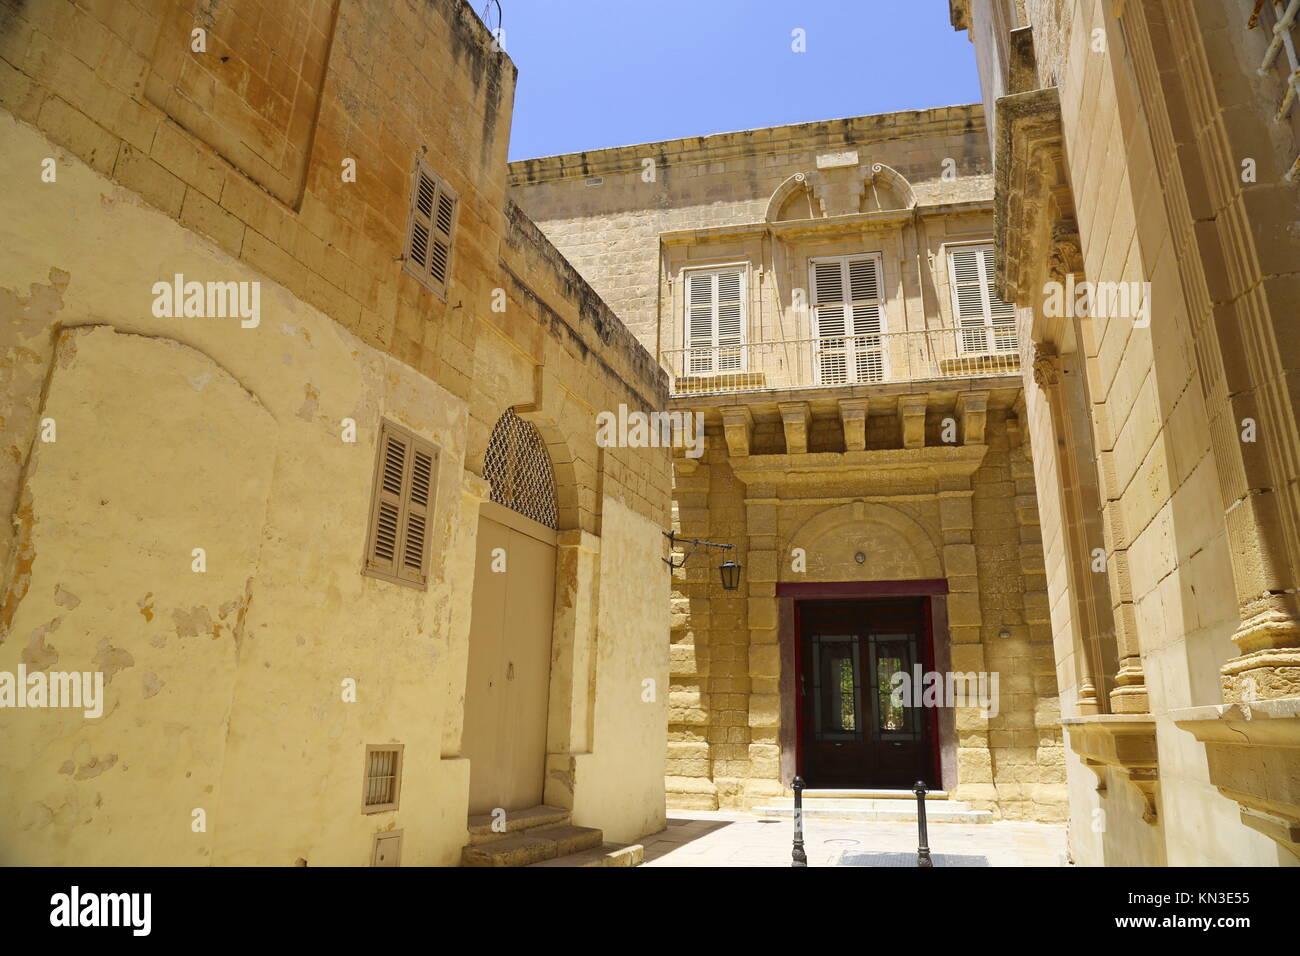 Historic Architecture in Mdina, Malta, southern Europe. - Stock Image